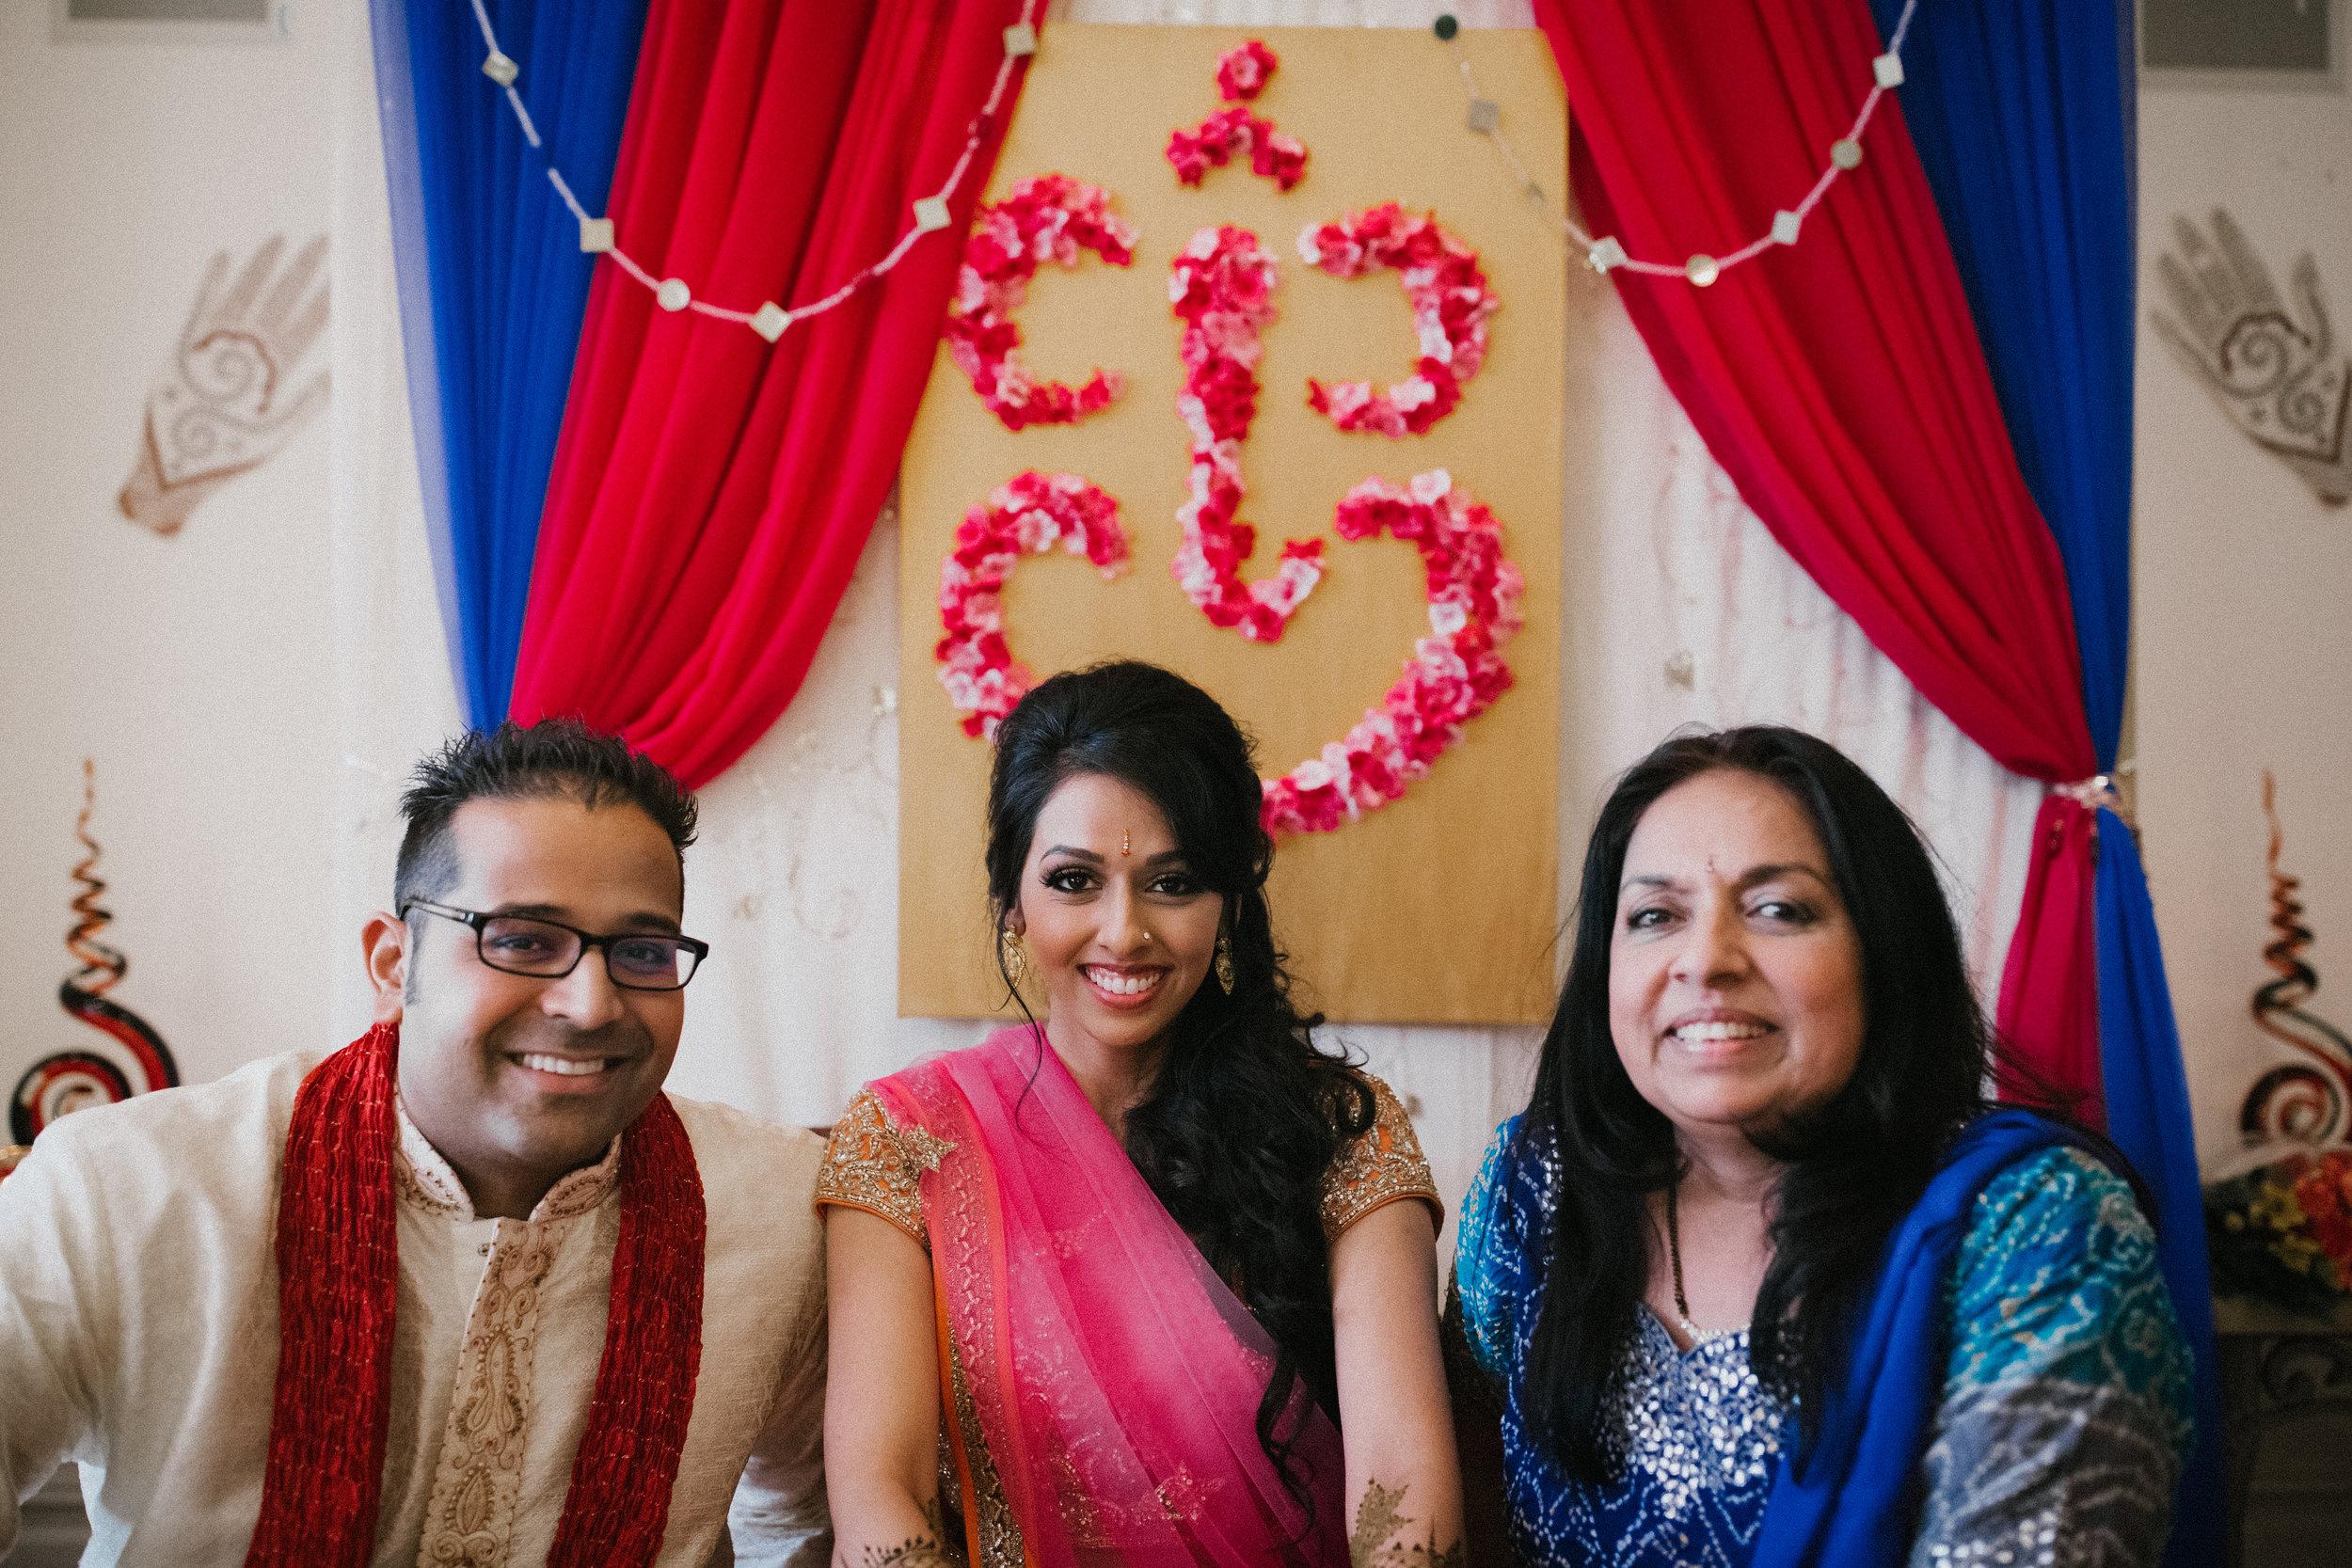 Aparna-Ankit-Patel-Mehndi-Wedding-Photos-0063.jpg